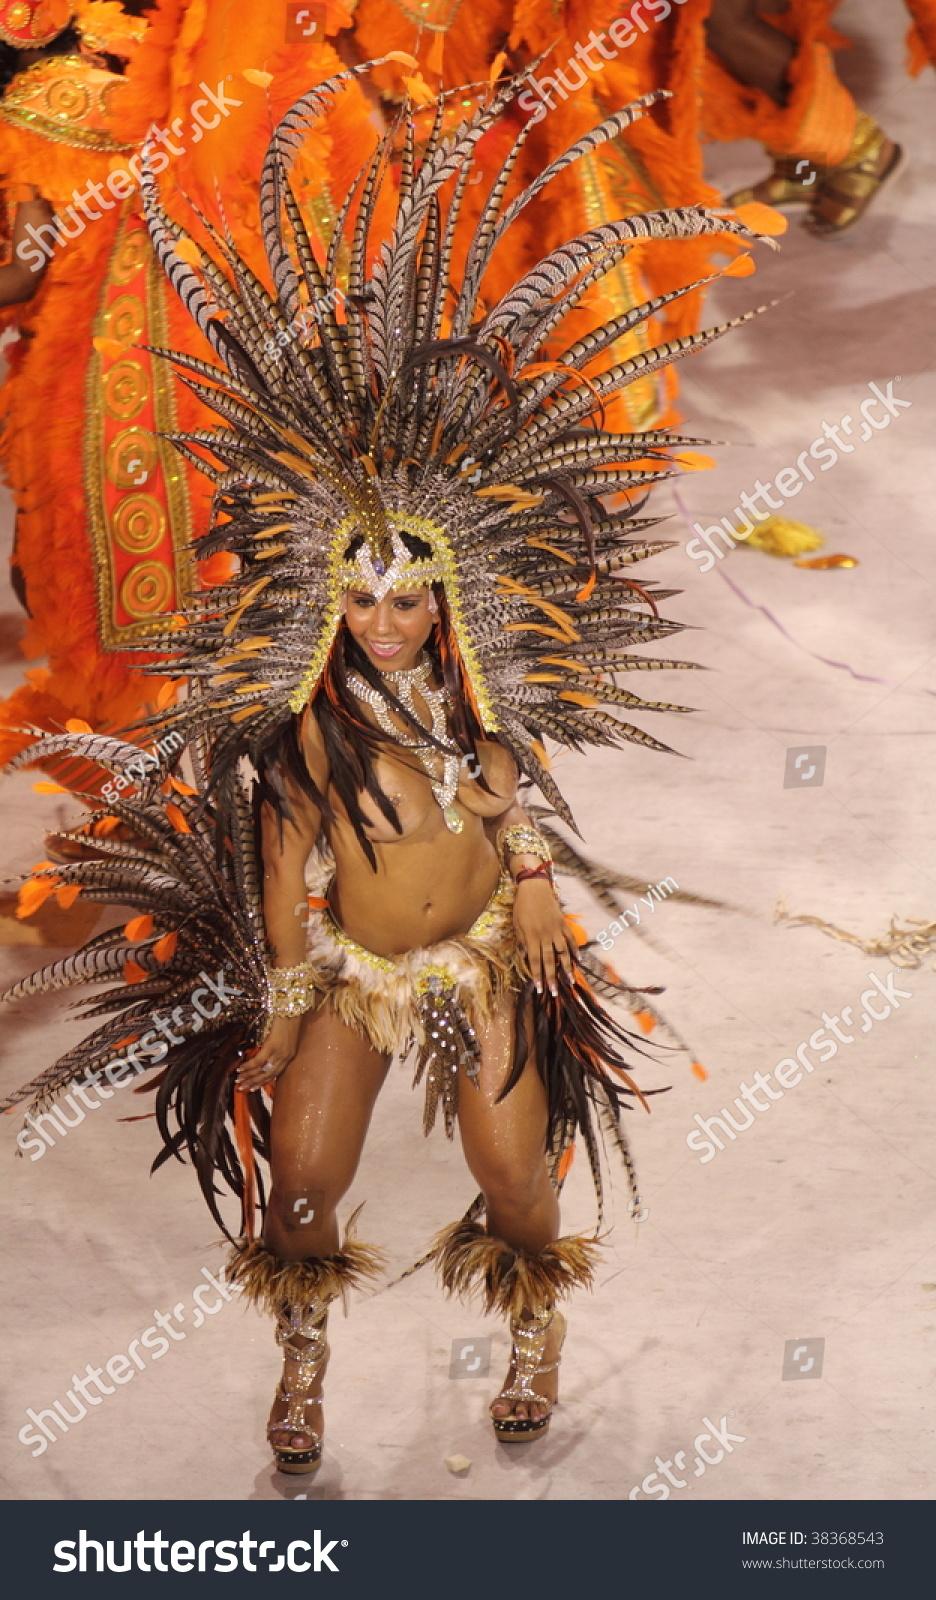 Rio De Janeiro February 22 Naked Stock Photo 38368543 -8749